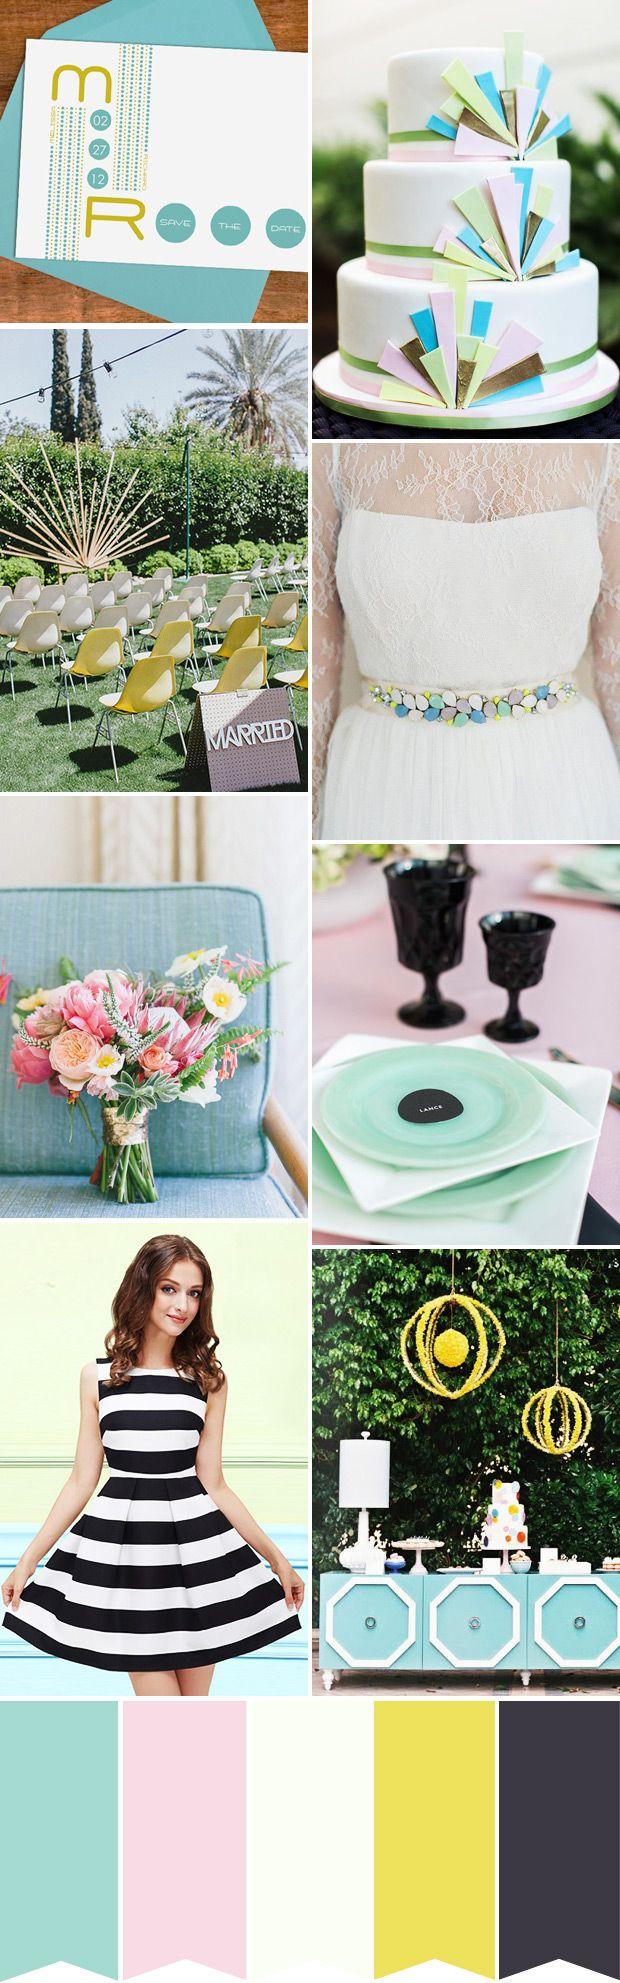 Pastel and Monochrome Wedding Palette with a Mid-Century Modern Twist   www.onefabday.com